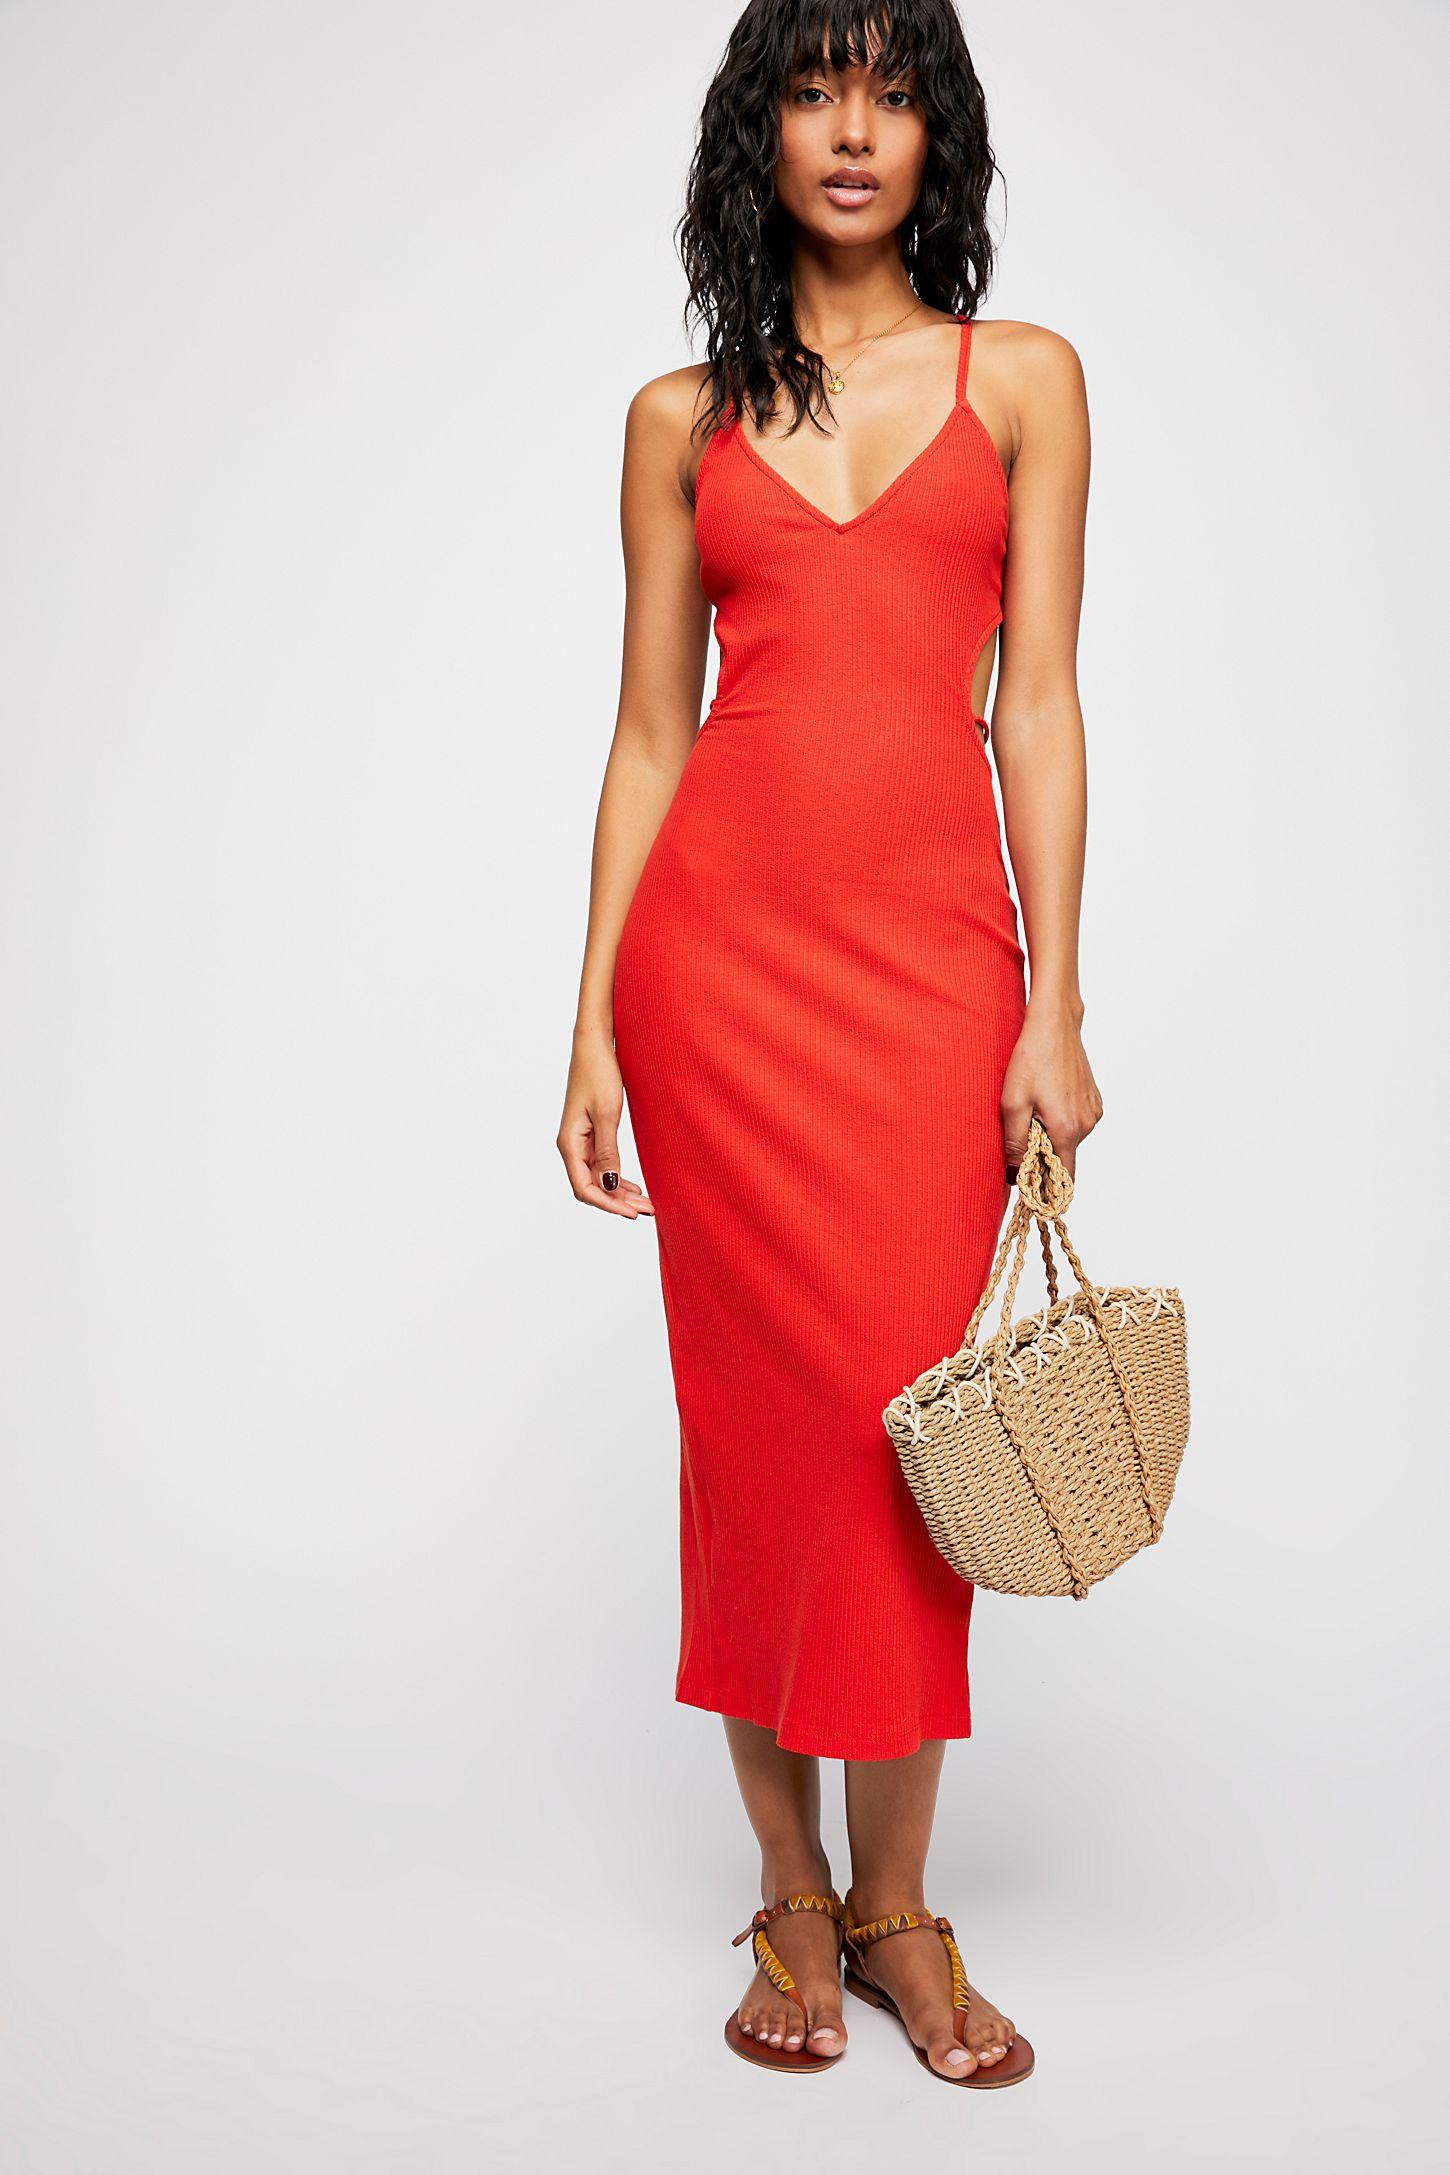 Hot Toddy Midi Dress | Free People